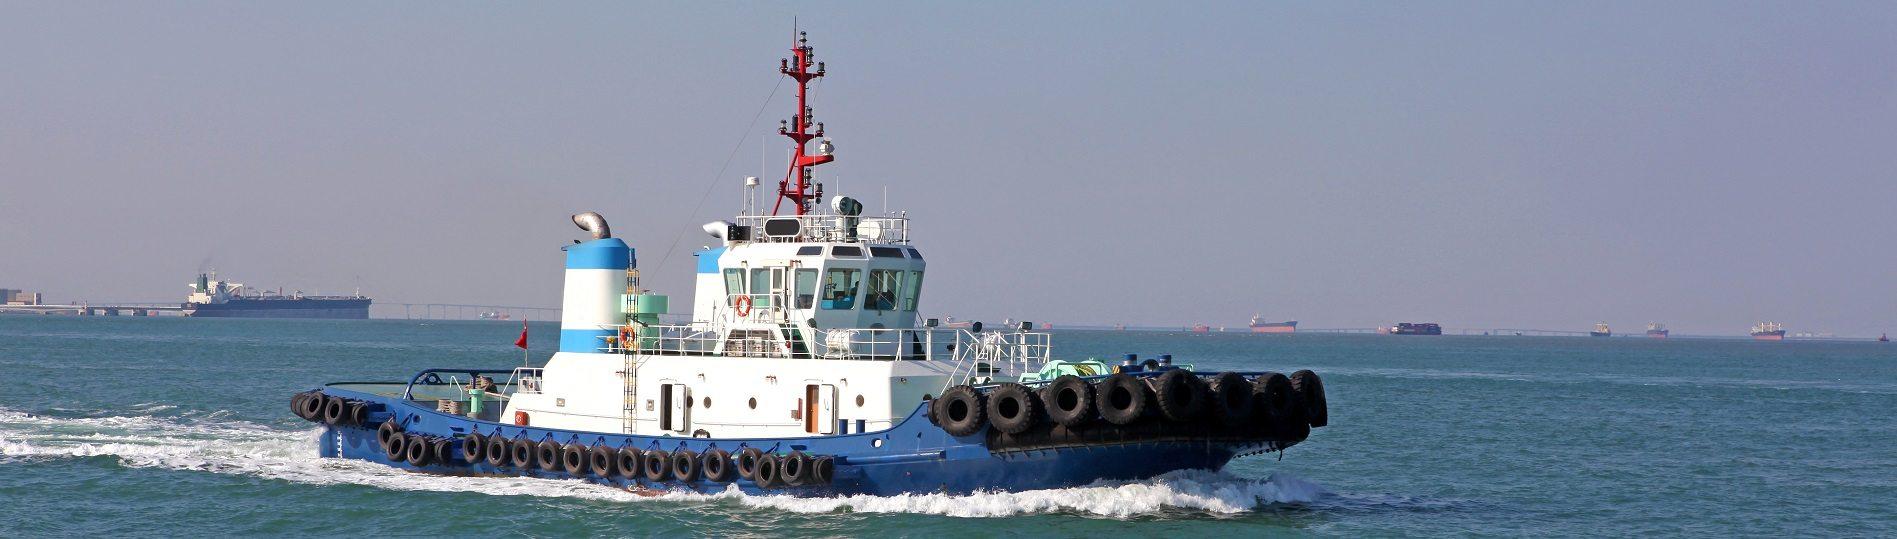 Courses | Maritime Courses | Marine Training Brisbane